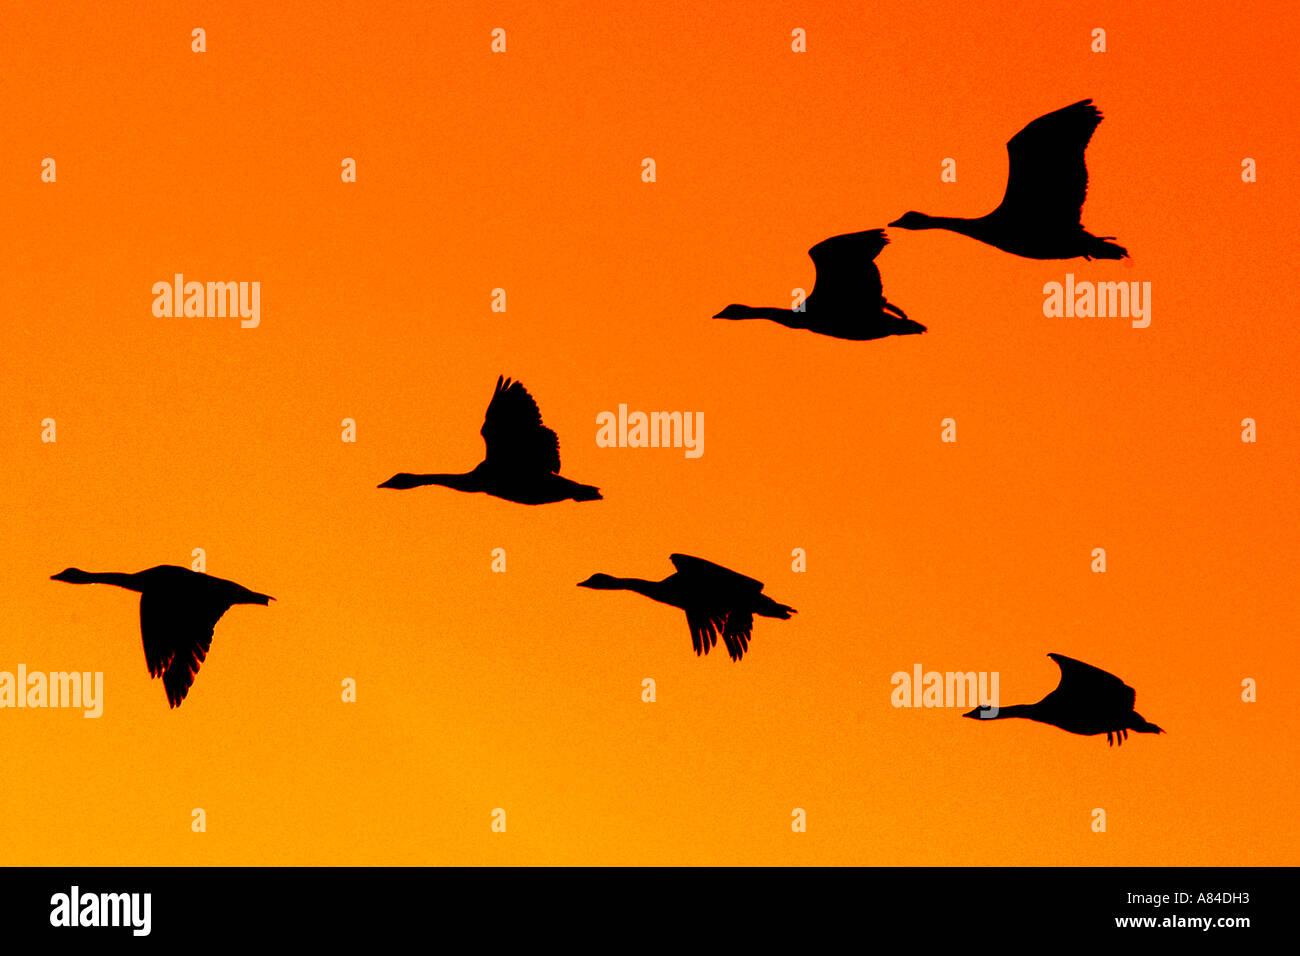 Canada Goose' sounds free